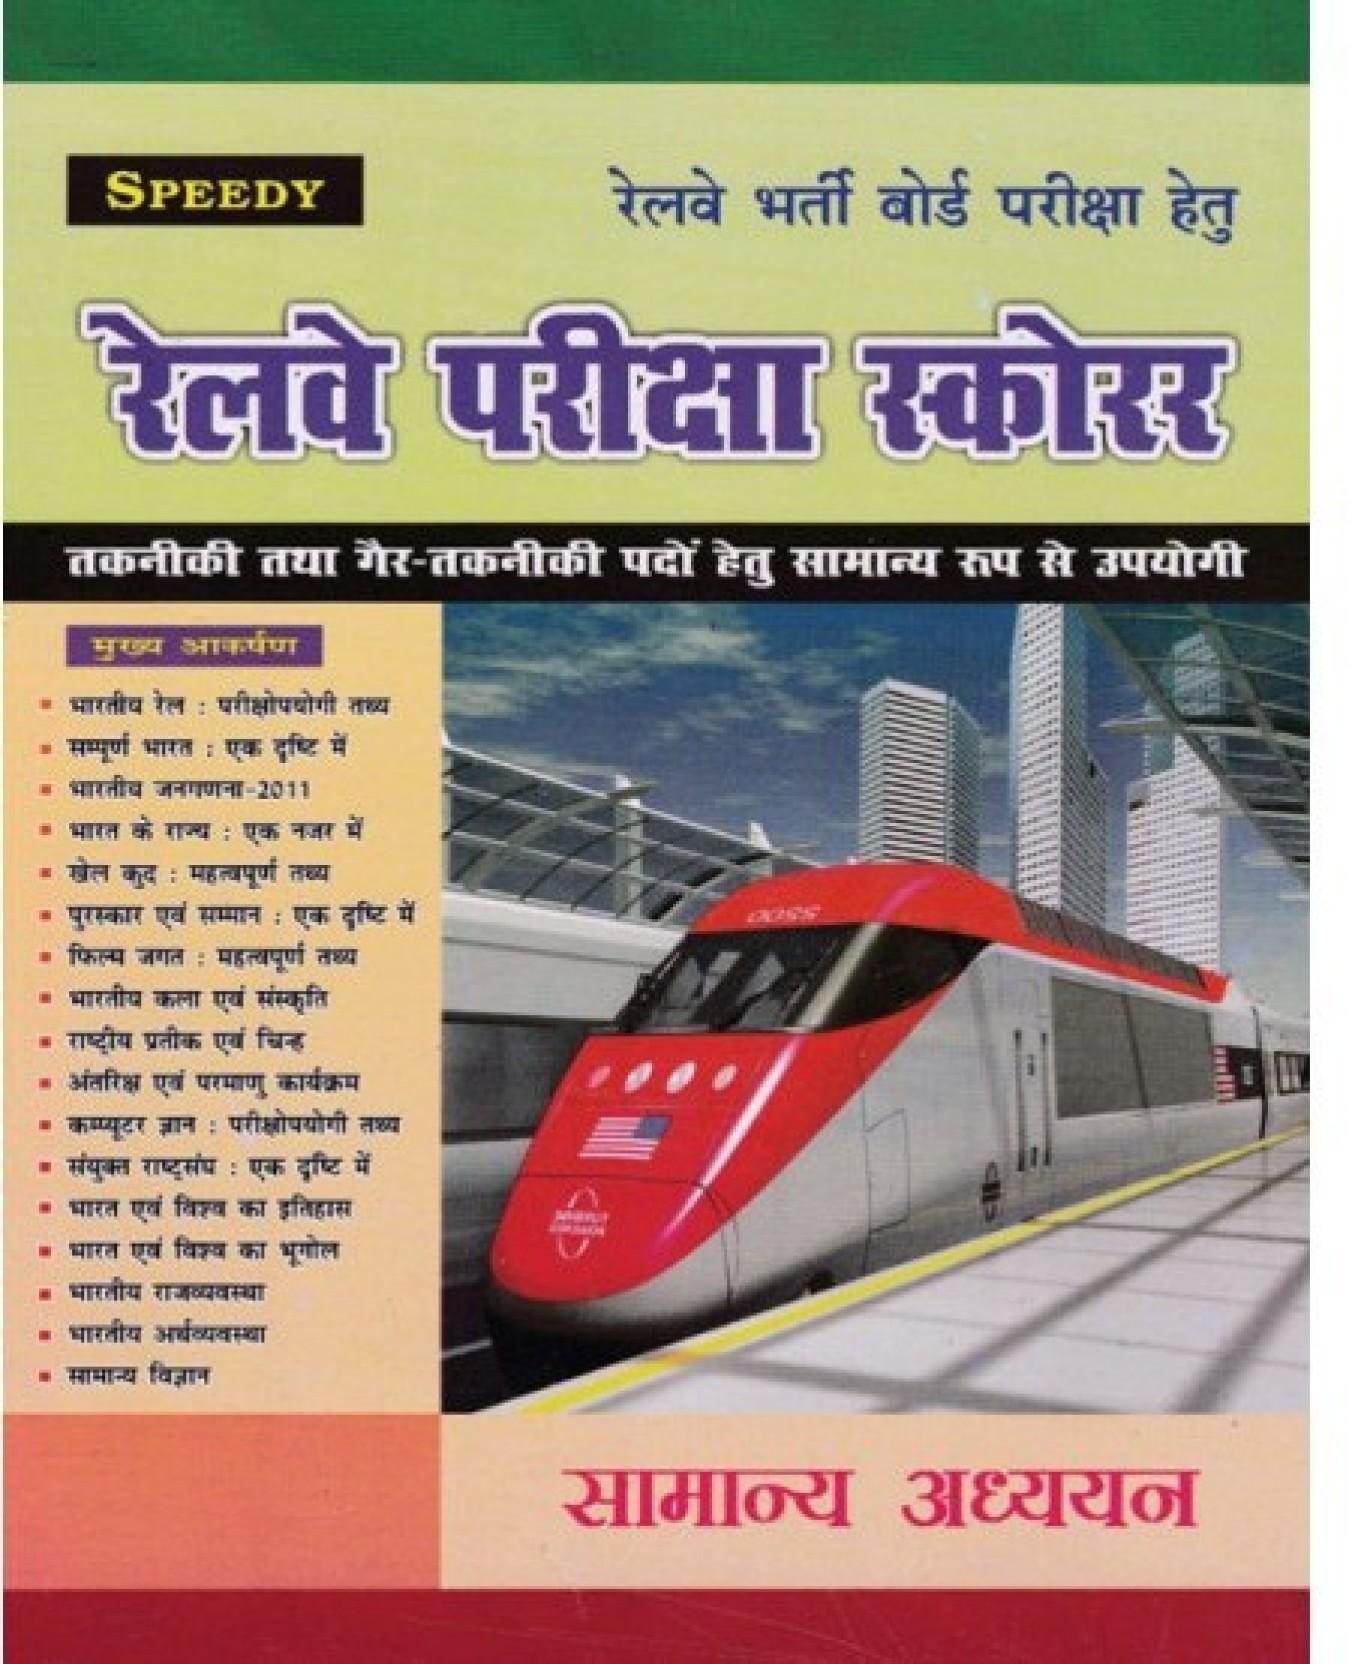 Speedy Railway Pariksha Scorrer Samanya Adhyayan. ADD TO CART